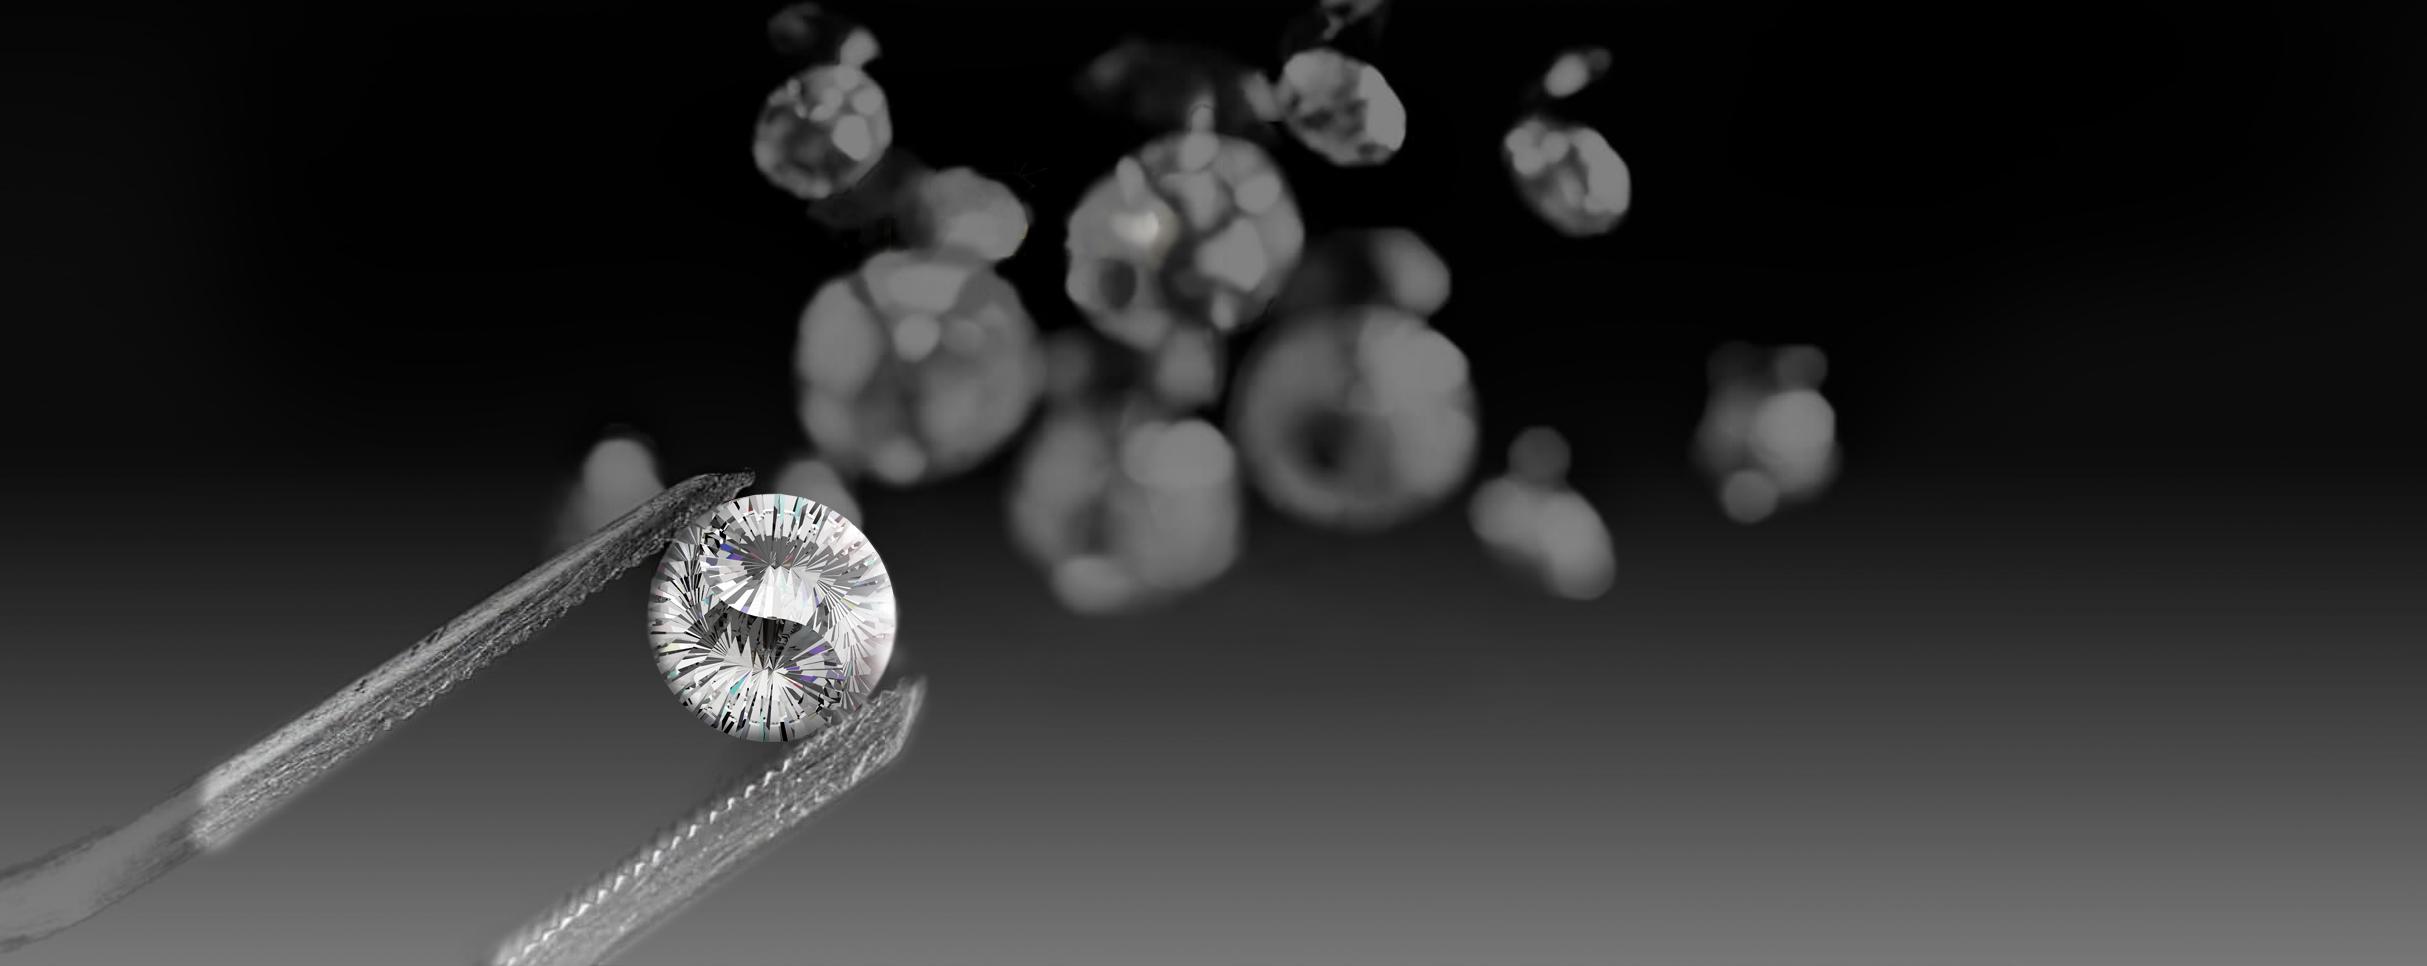 Athena-diamond-cut-special-diamond-unique